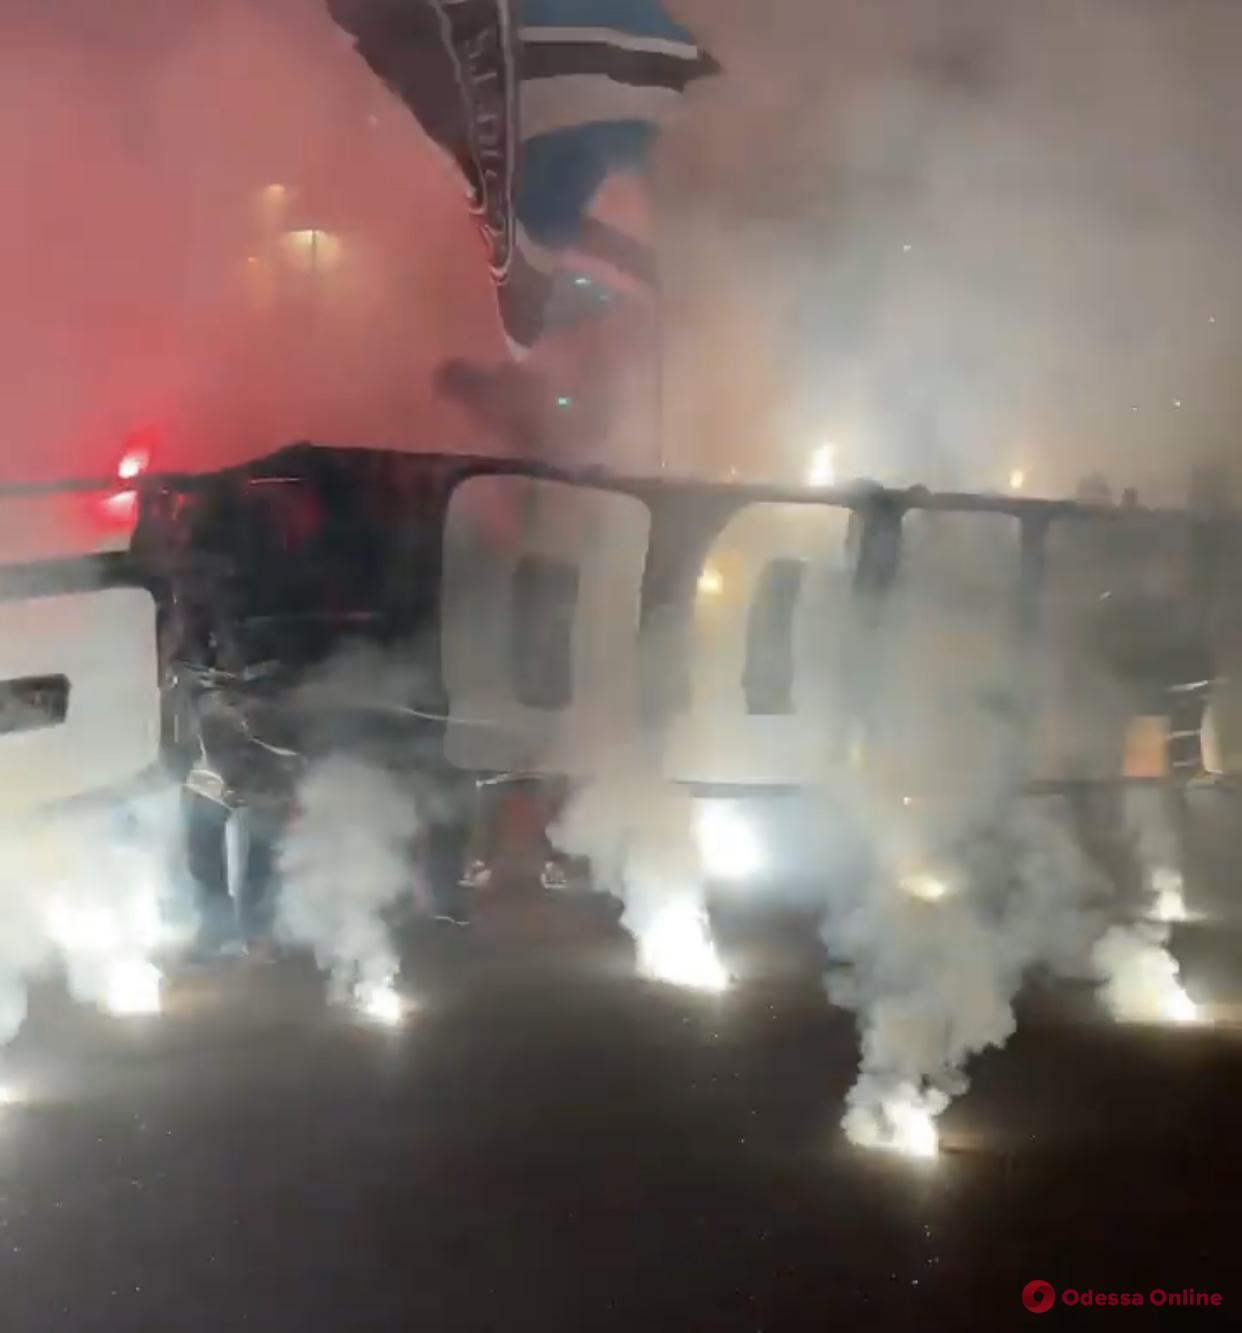 Фанаты одесского «Черноморца» поздравили клуб масштабным фаер-шоу (видео)